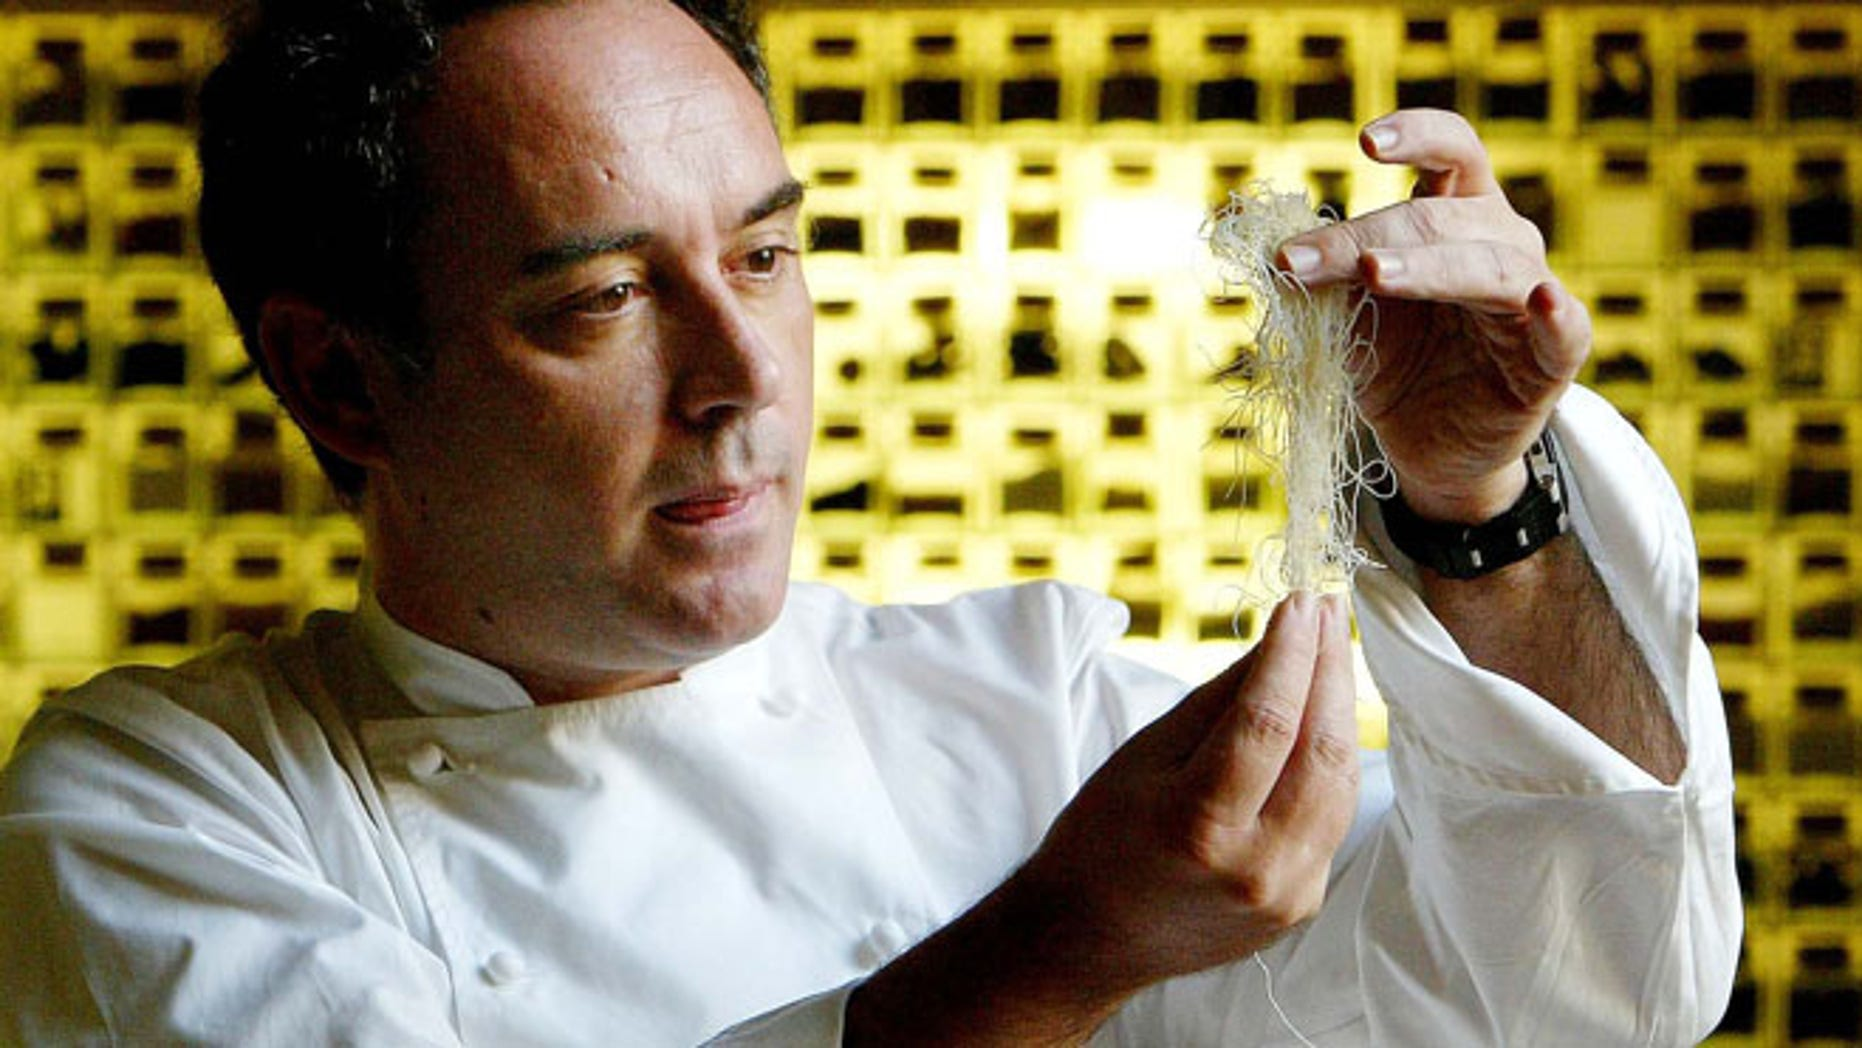 Dec. 5, 2003: Spanish chef Ferran Adria examines ingredients in his kitchen workshop in Barcelona, Spain.